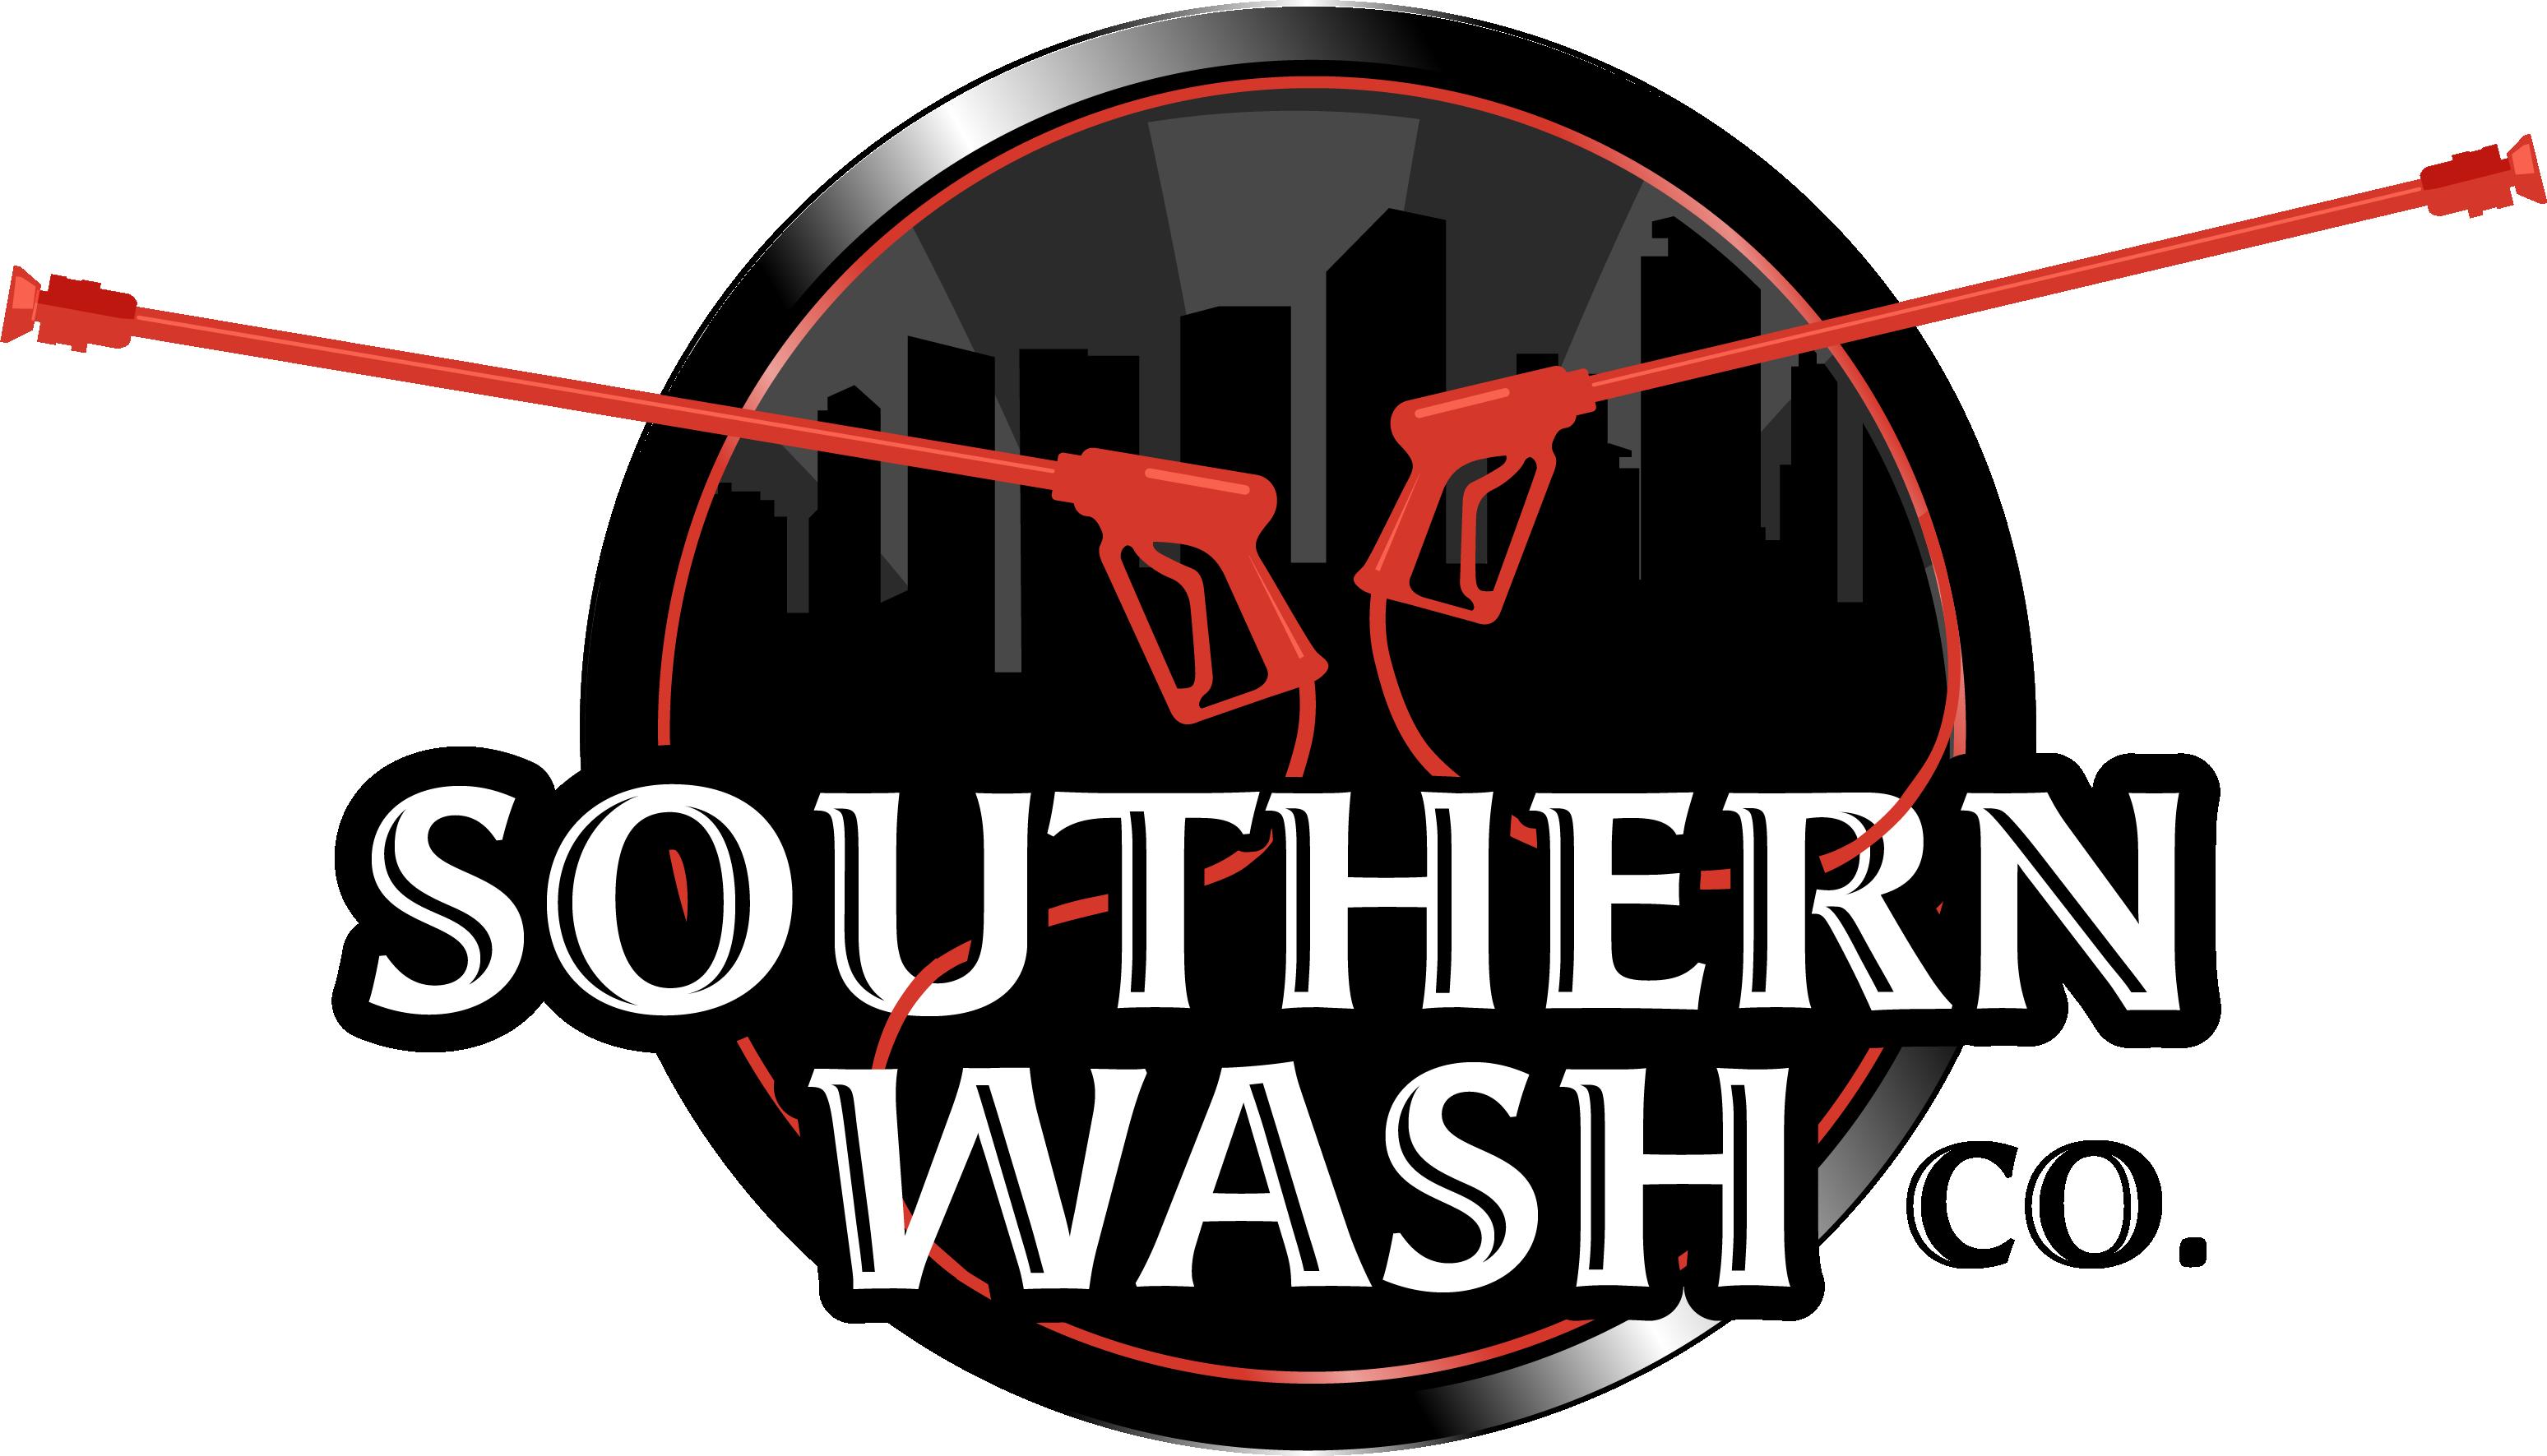 Southern Wash Co  - Macon Pressure Washing Company